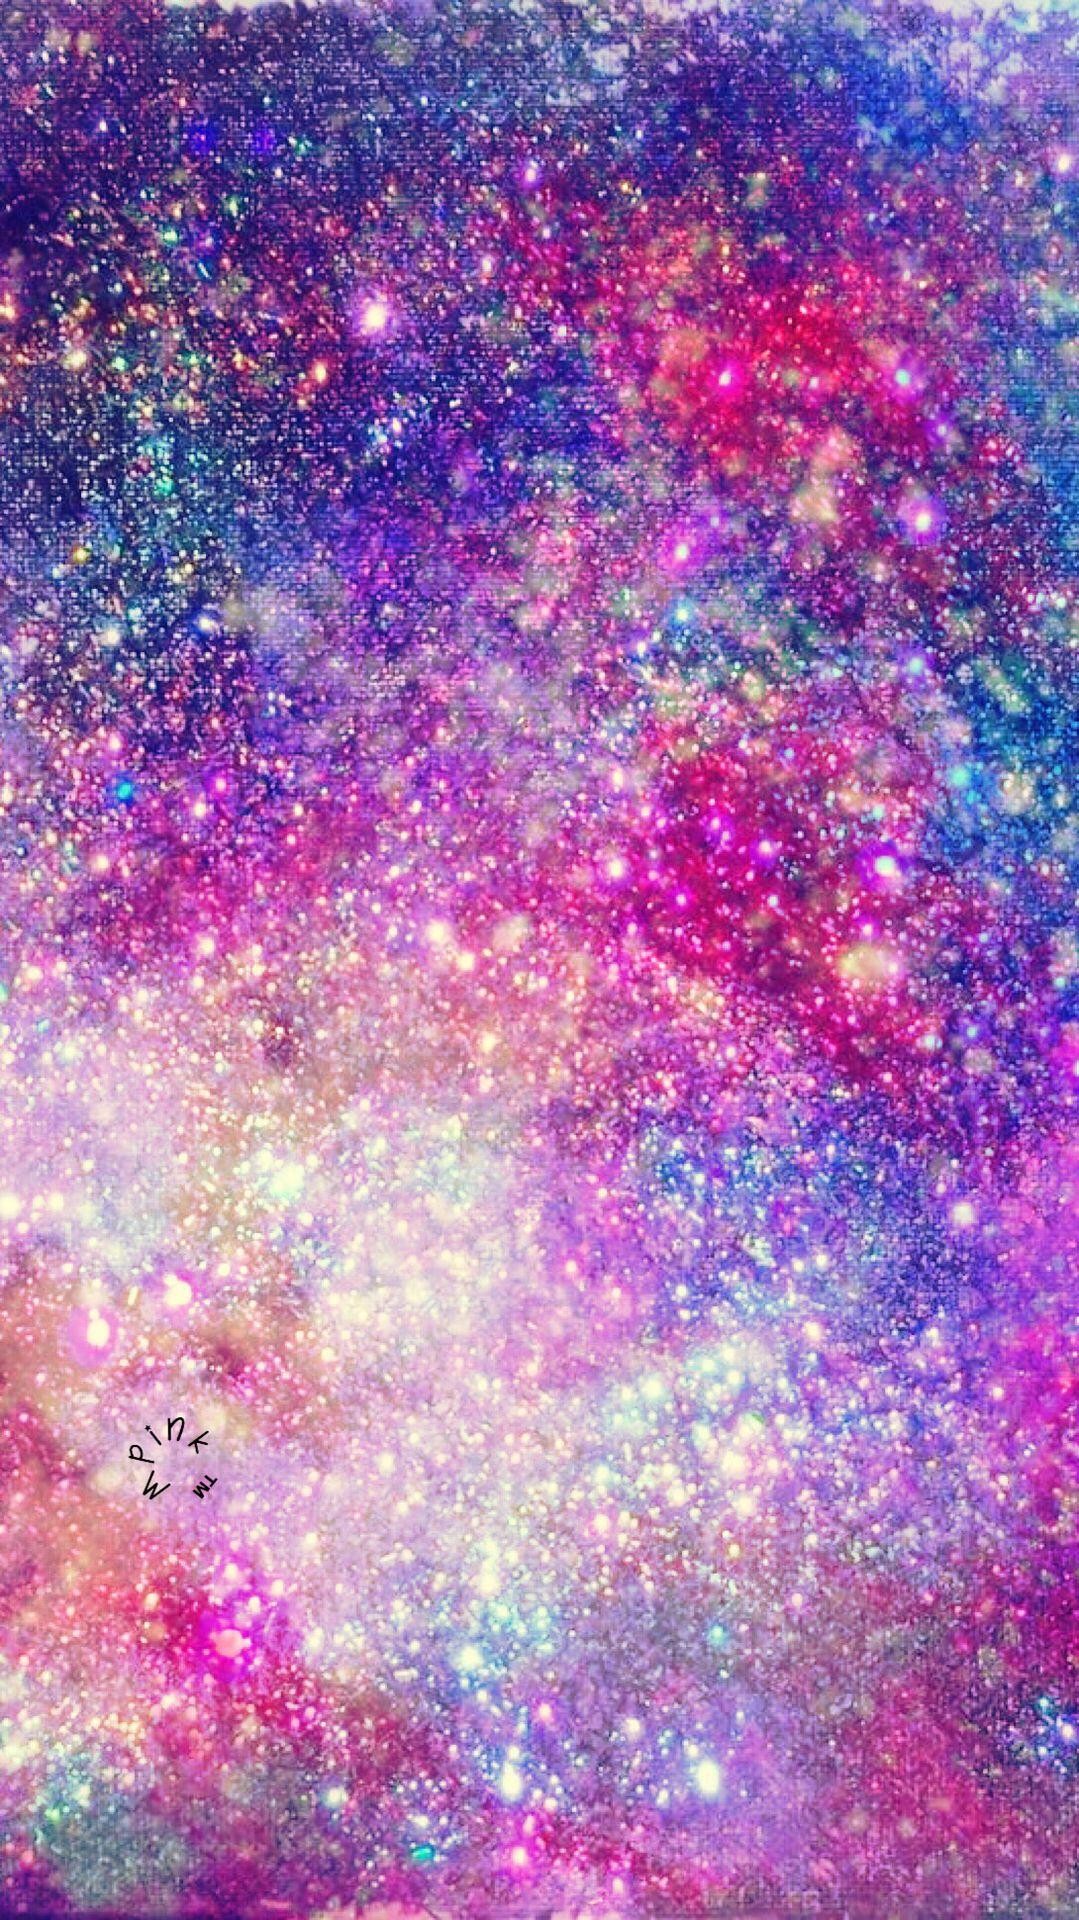 Galaxy Splash Wallpaper ᗯᗩᒪᒪᑭᗩᑭEᖇ ᑕᖇEᗩTIOᑎᔕ Pinterest